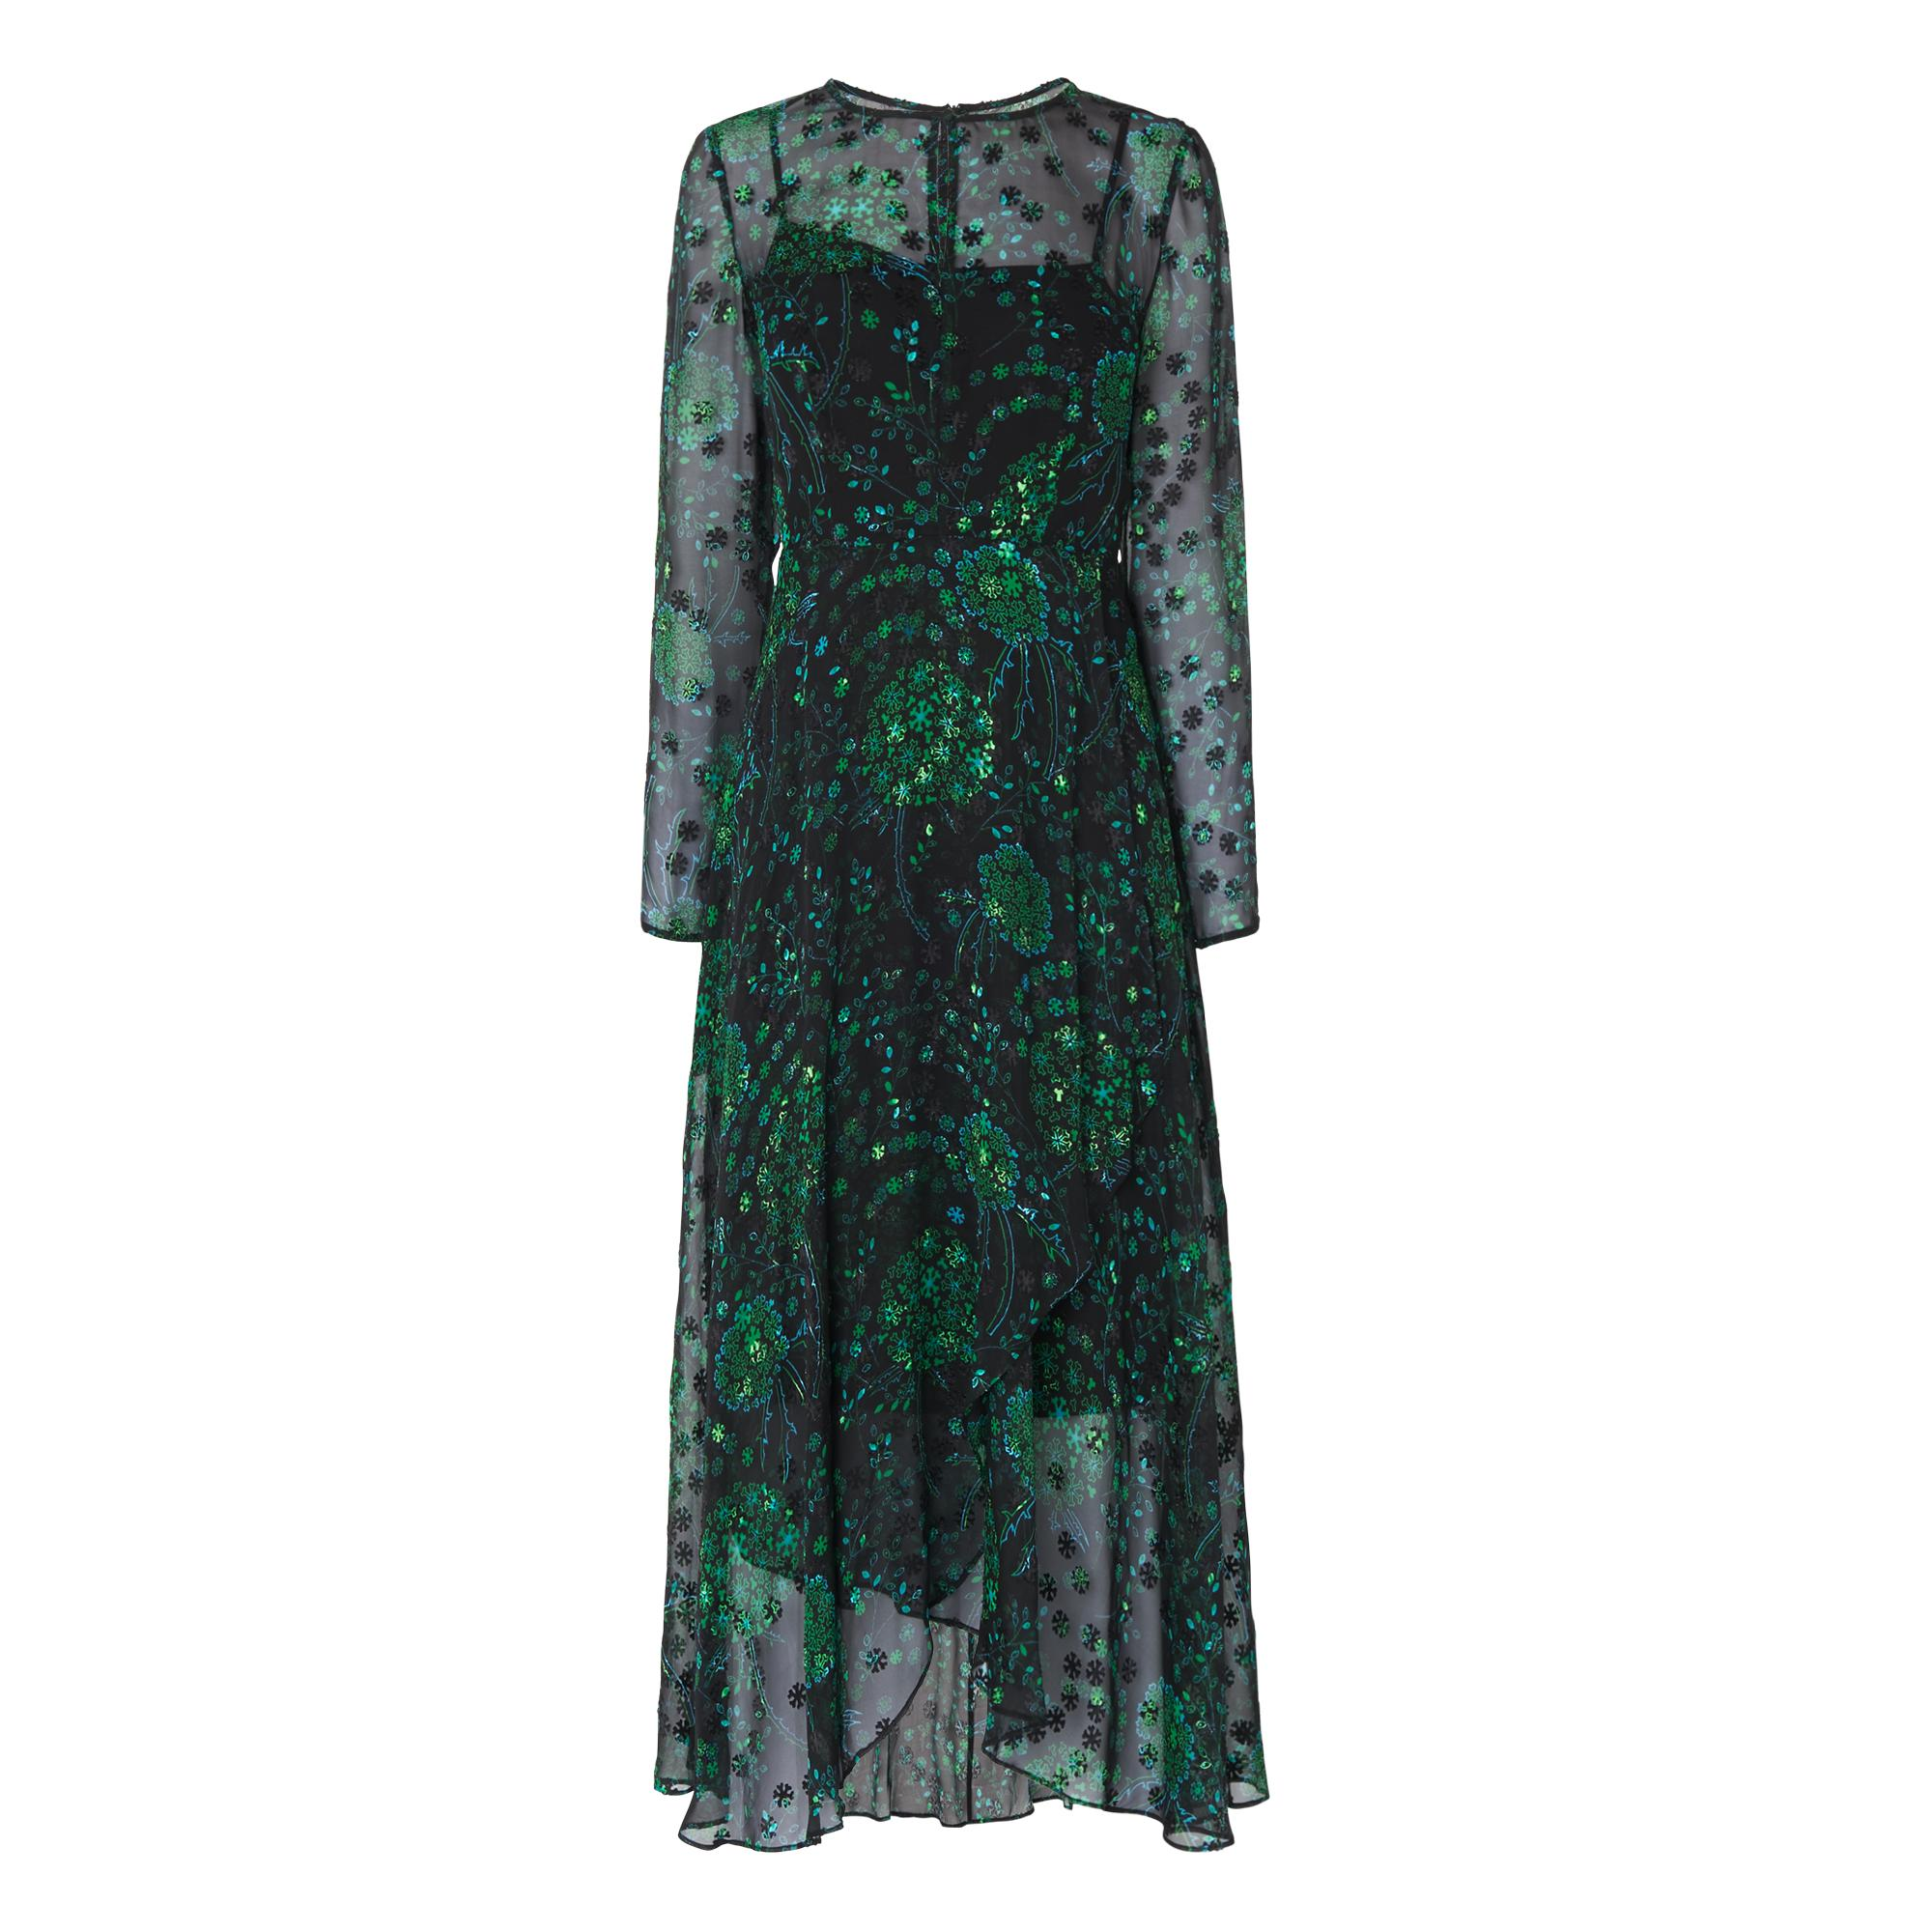 Roe Dress